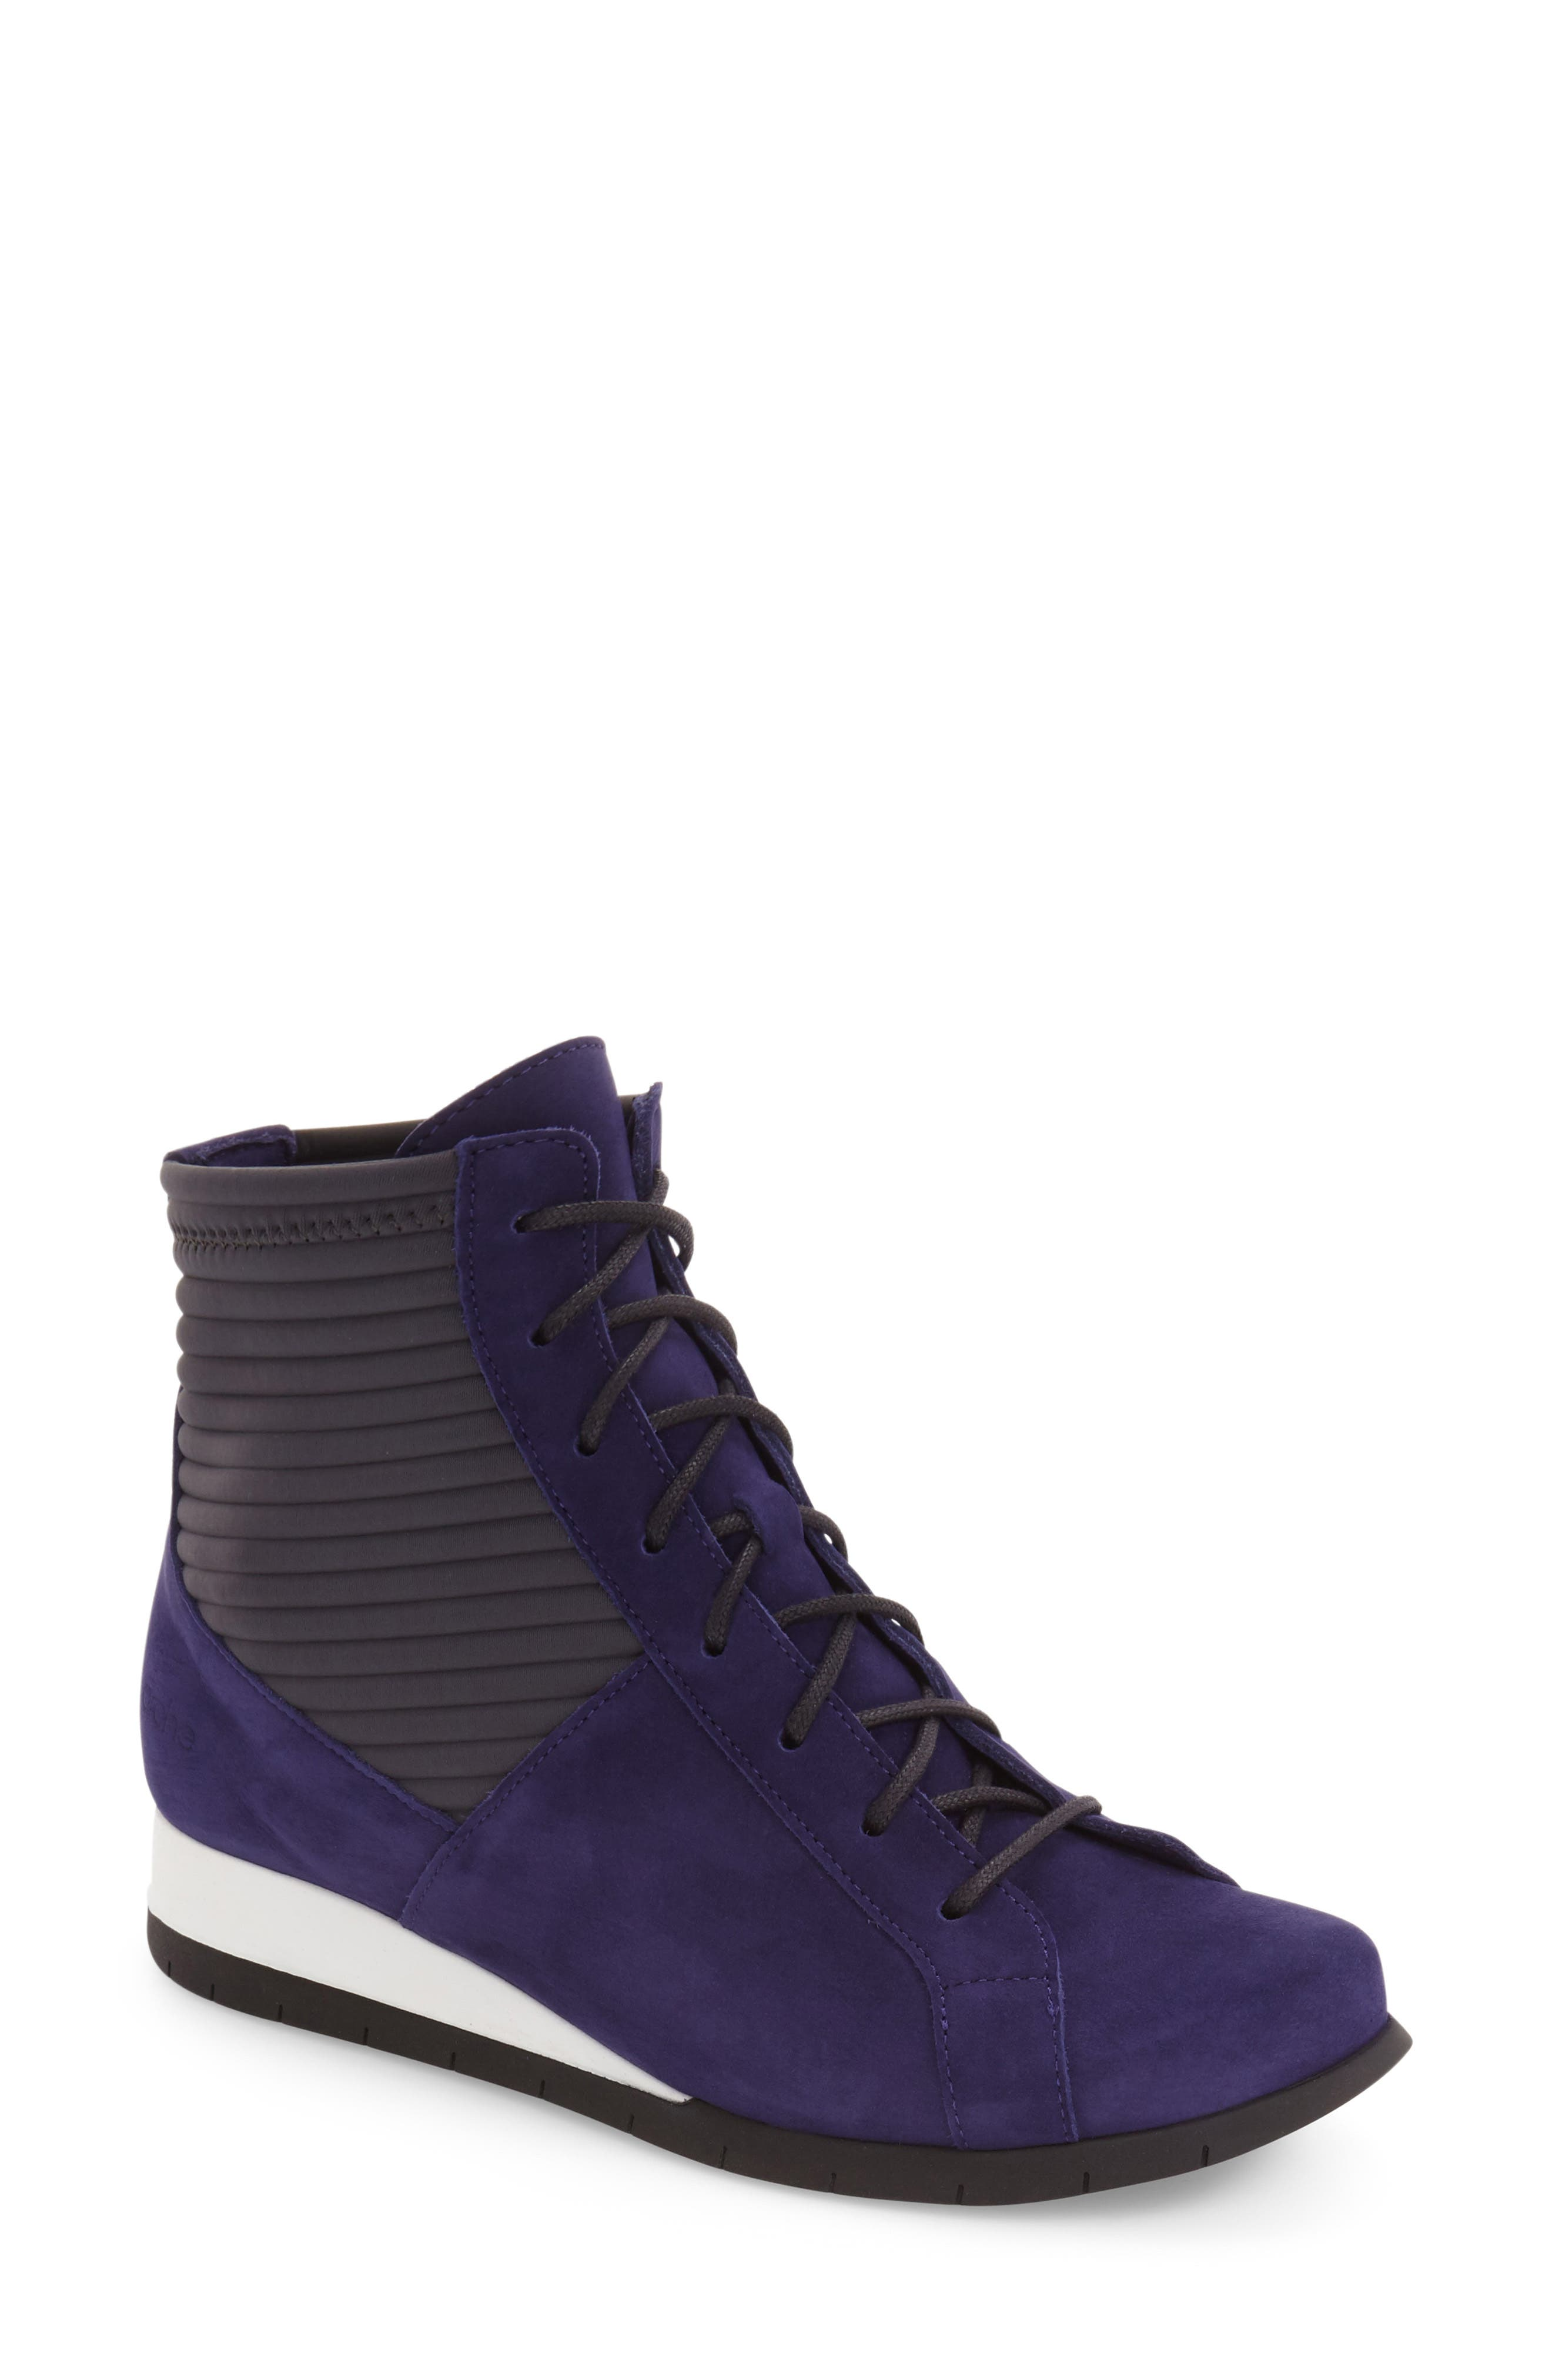 Alternate Image 1 Selected - Arche 'Situ' Wedge High Top Sneaker (Women)